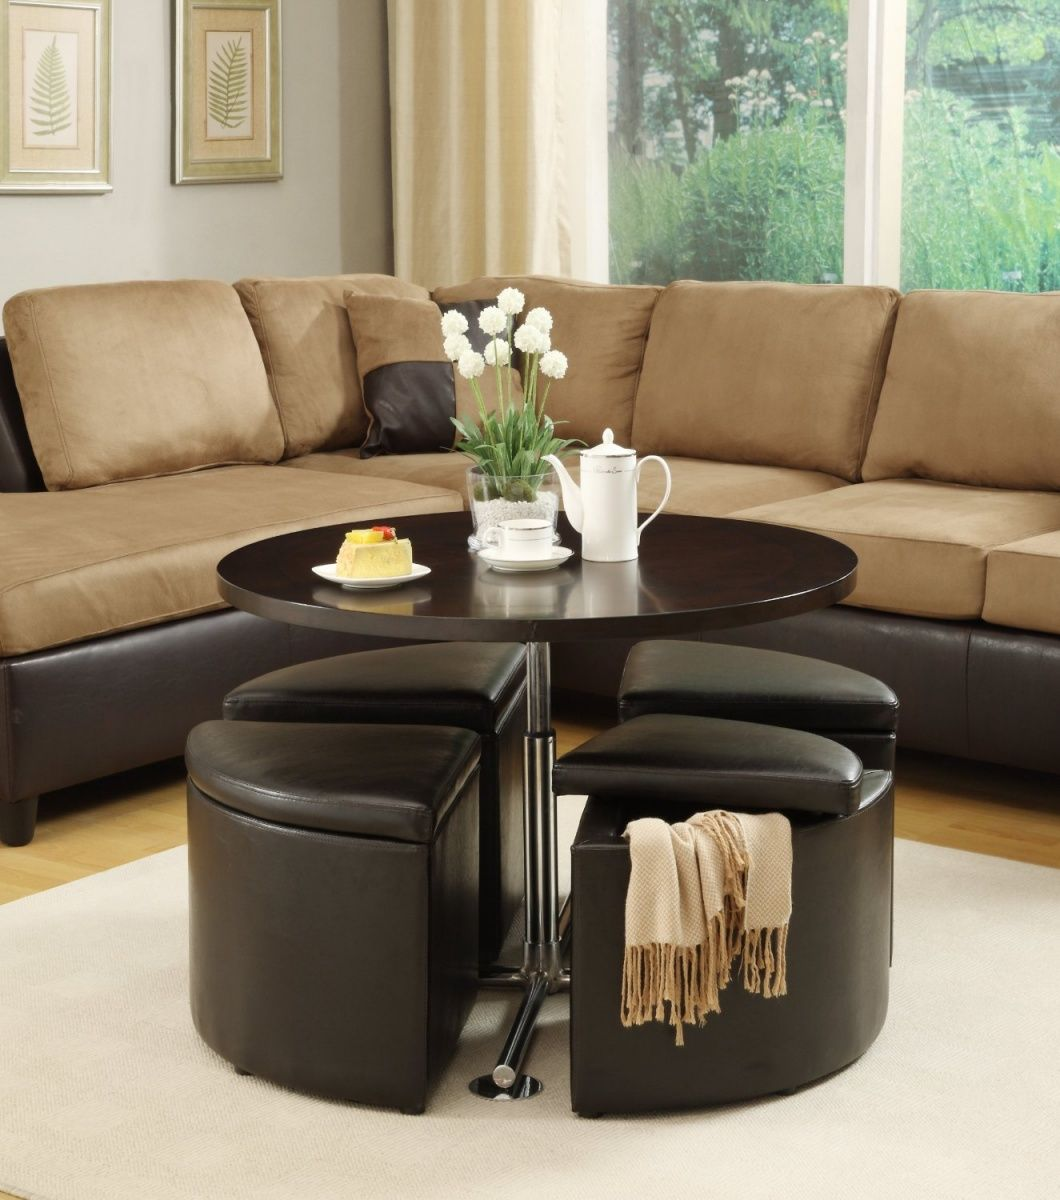 Furniture Amazing Round Black Coffee Table Living Room Design Ideas Plus Comfortable Two Tones Sofa Also Mini Pot Beautify Your Living Roo Stool Storage Ebay [ 1200 x 1060 Pixel ]